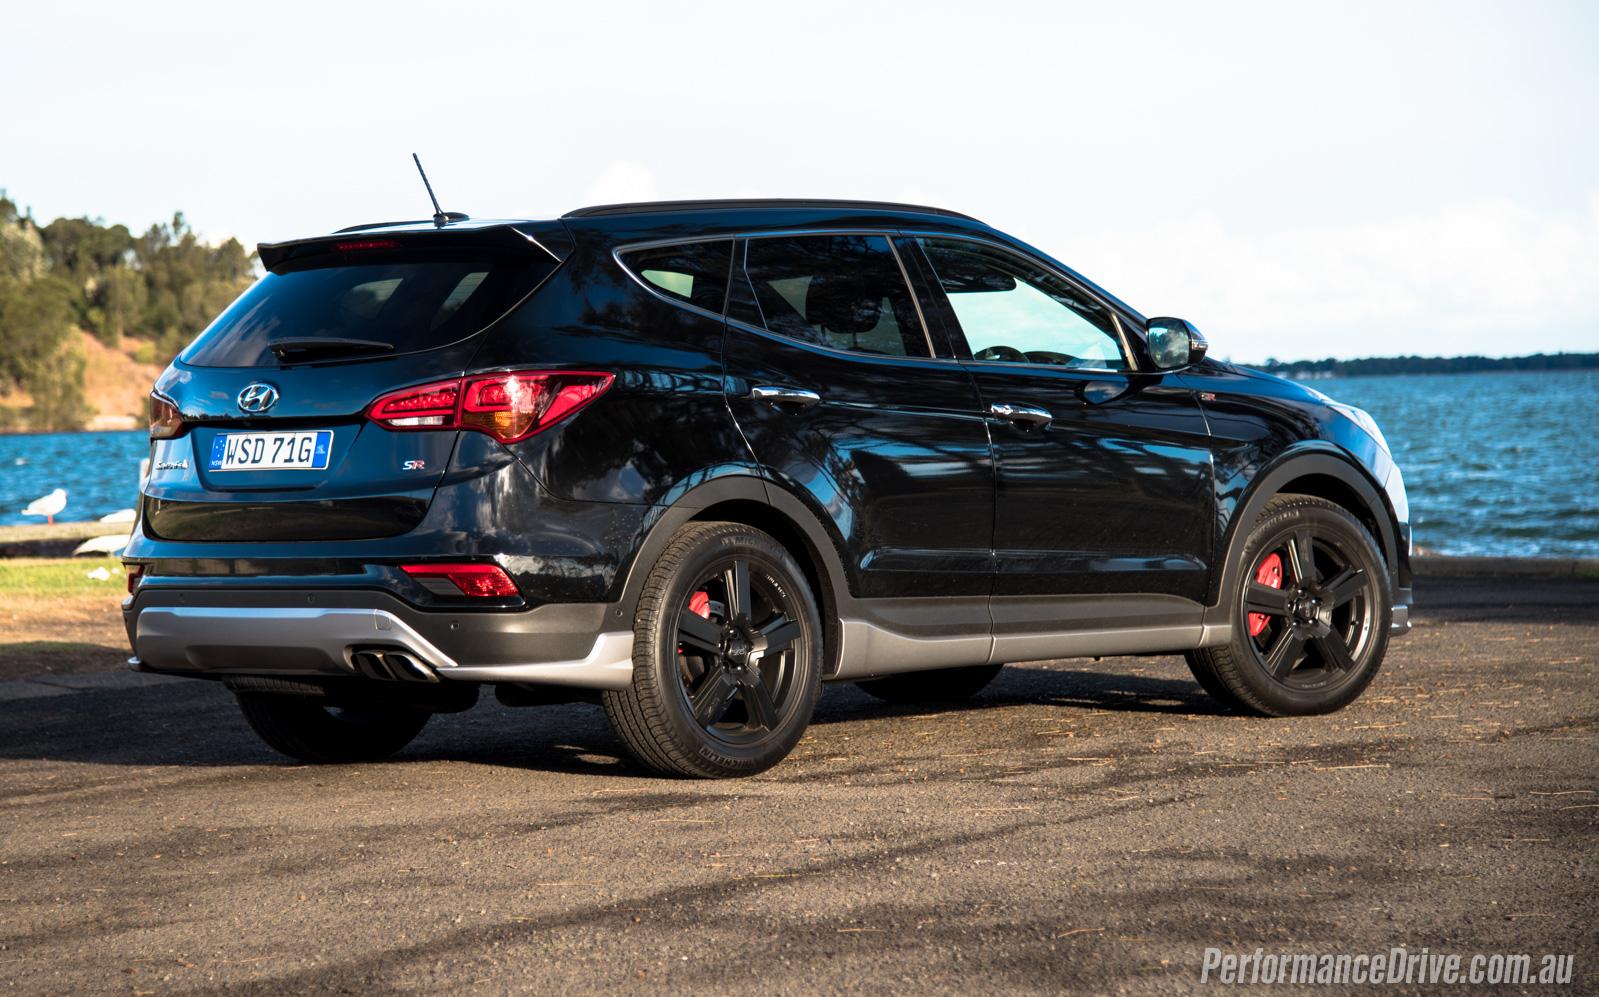 2016 Hyundai Santa Fe >> 2016 Hyundai Santa Fe SR review (video) | PerformanceDrive